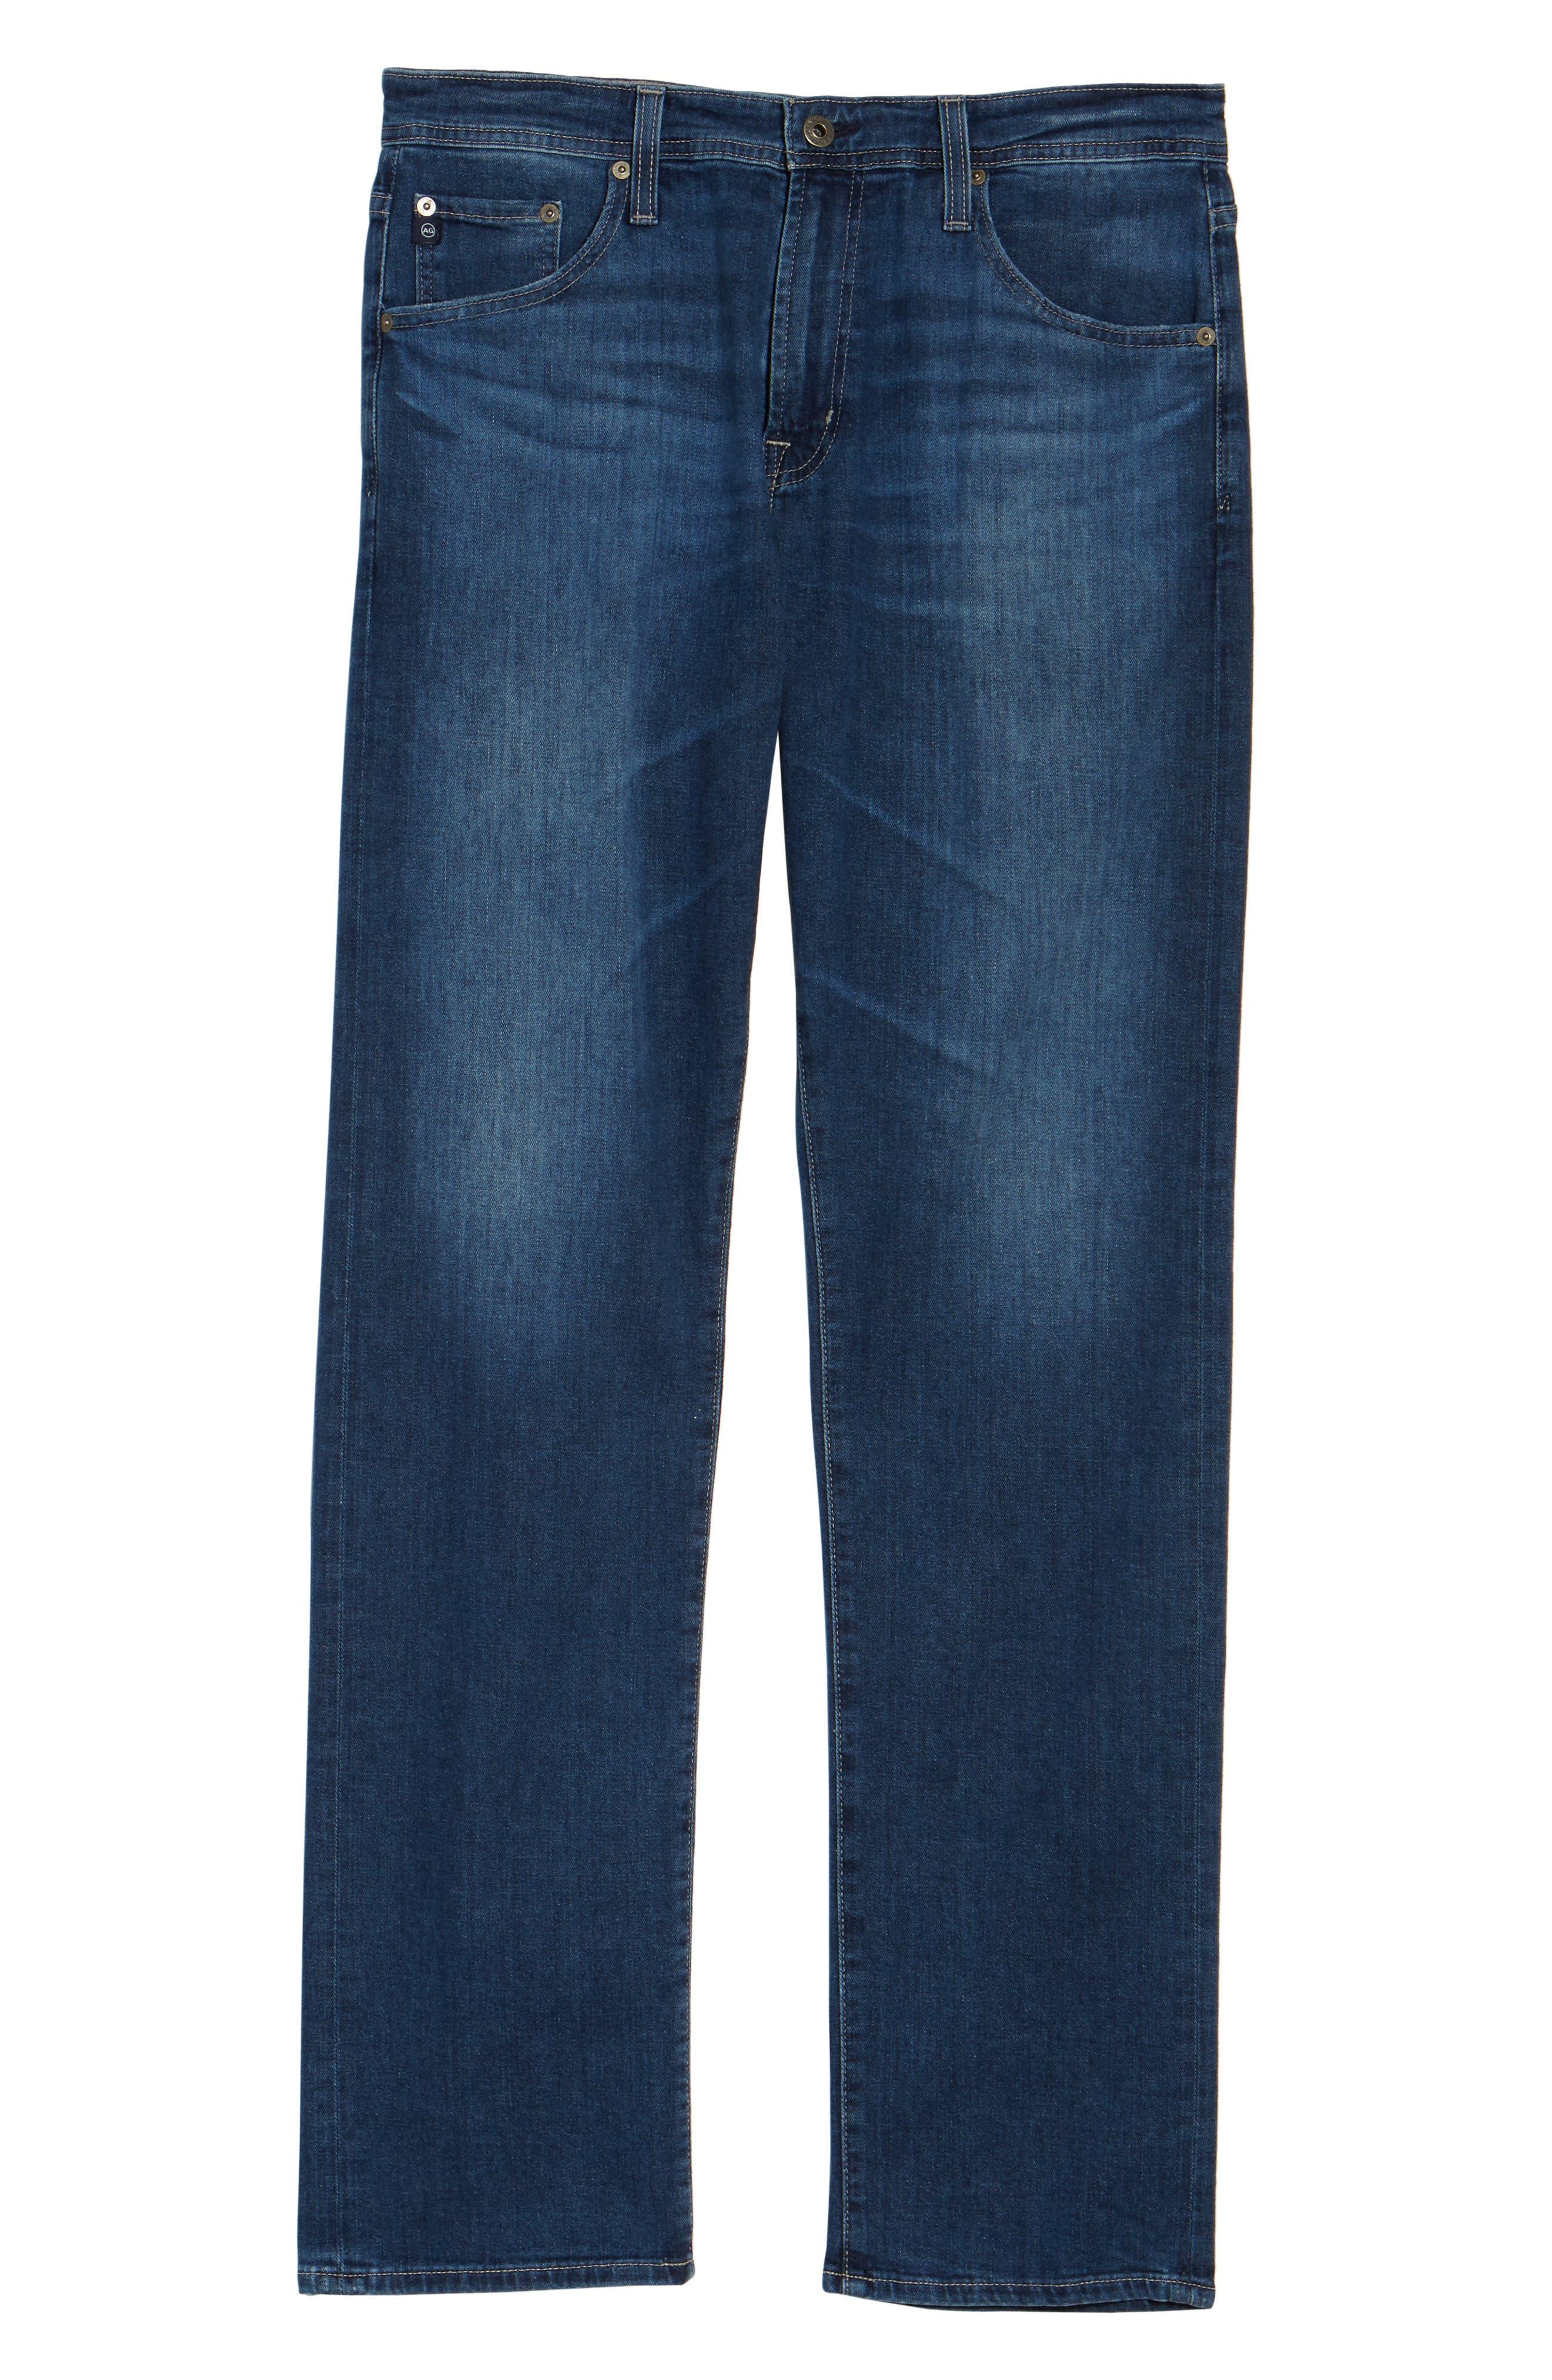 Ives Straight Leg Jeans,                             Alternate thumbnail 6, color,                             486